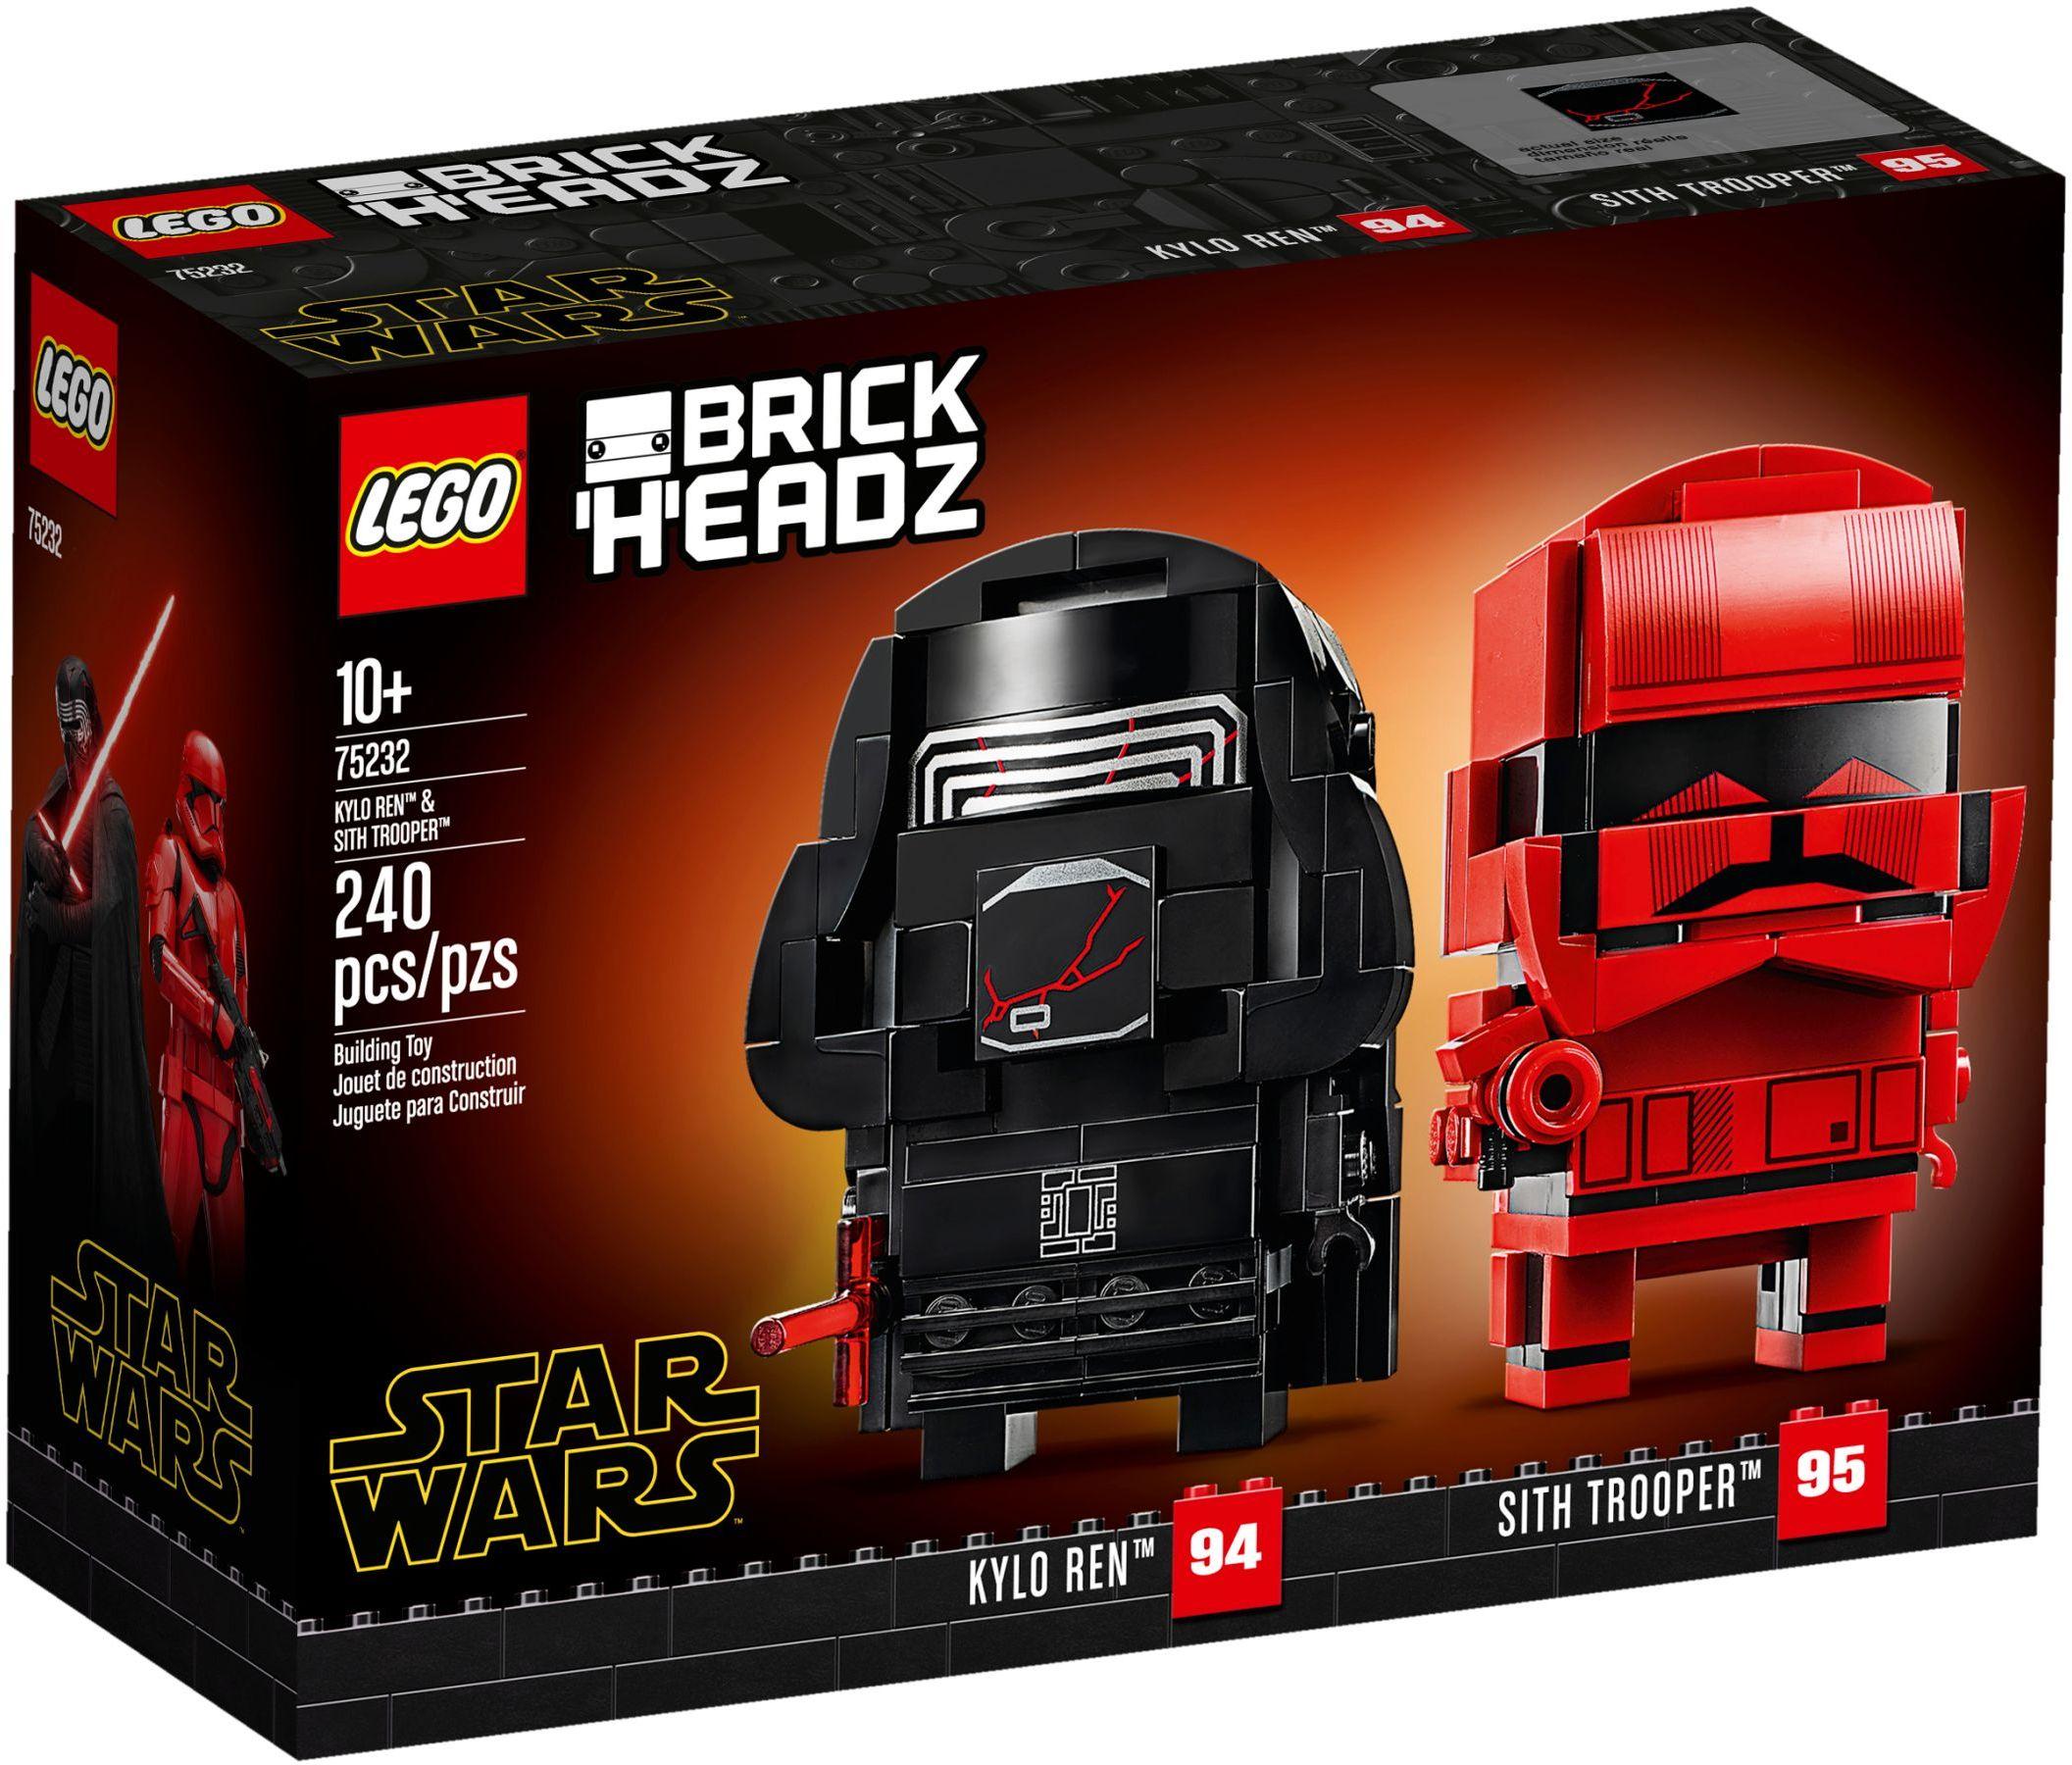 lego-brickheadz-75232-kylon-ren-sith-trooper-box zusammengebaut.com